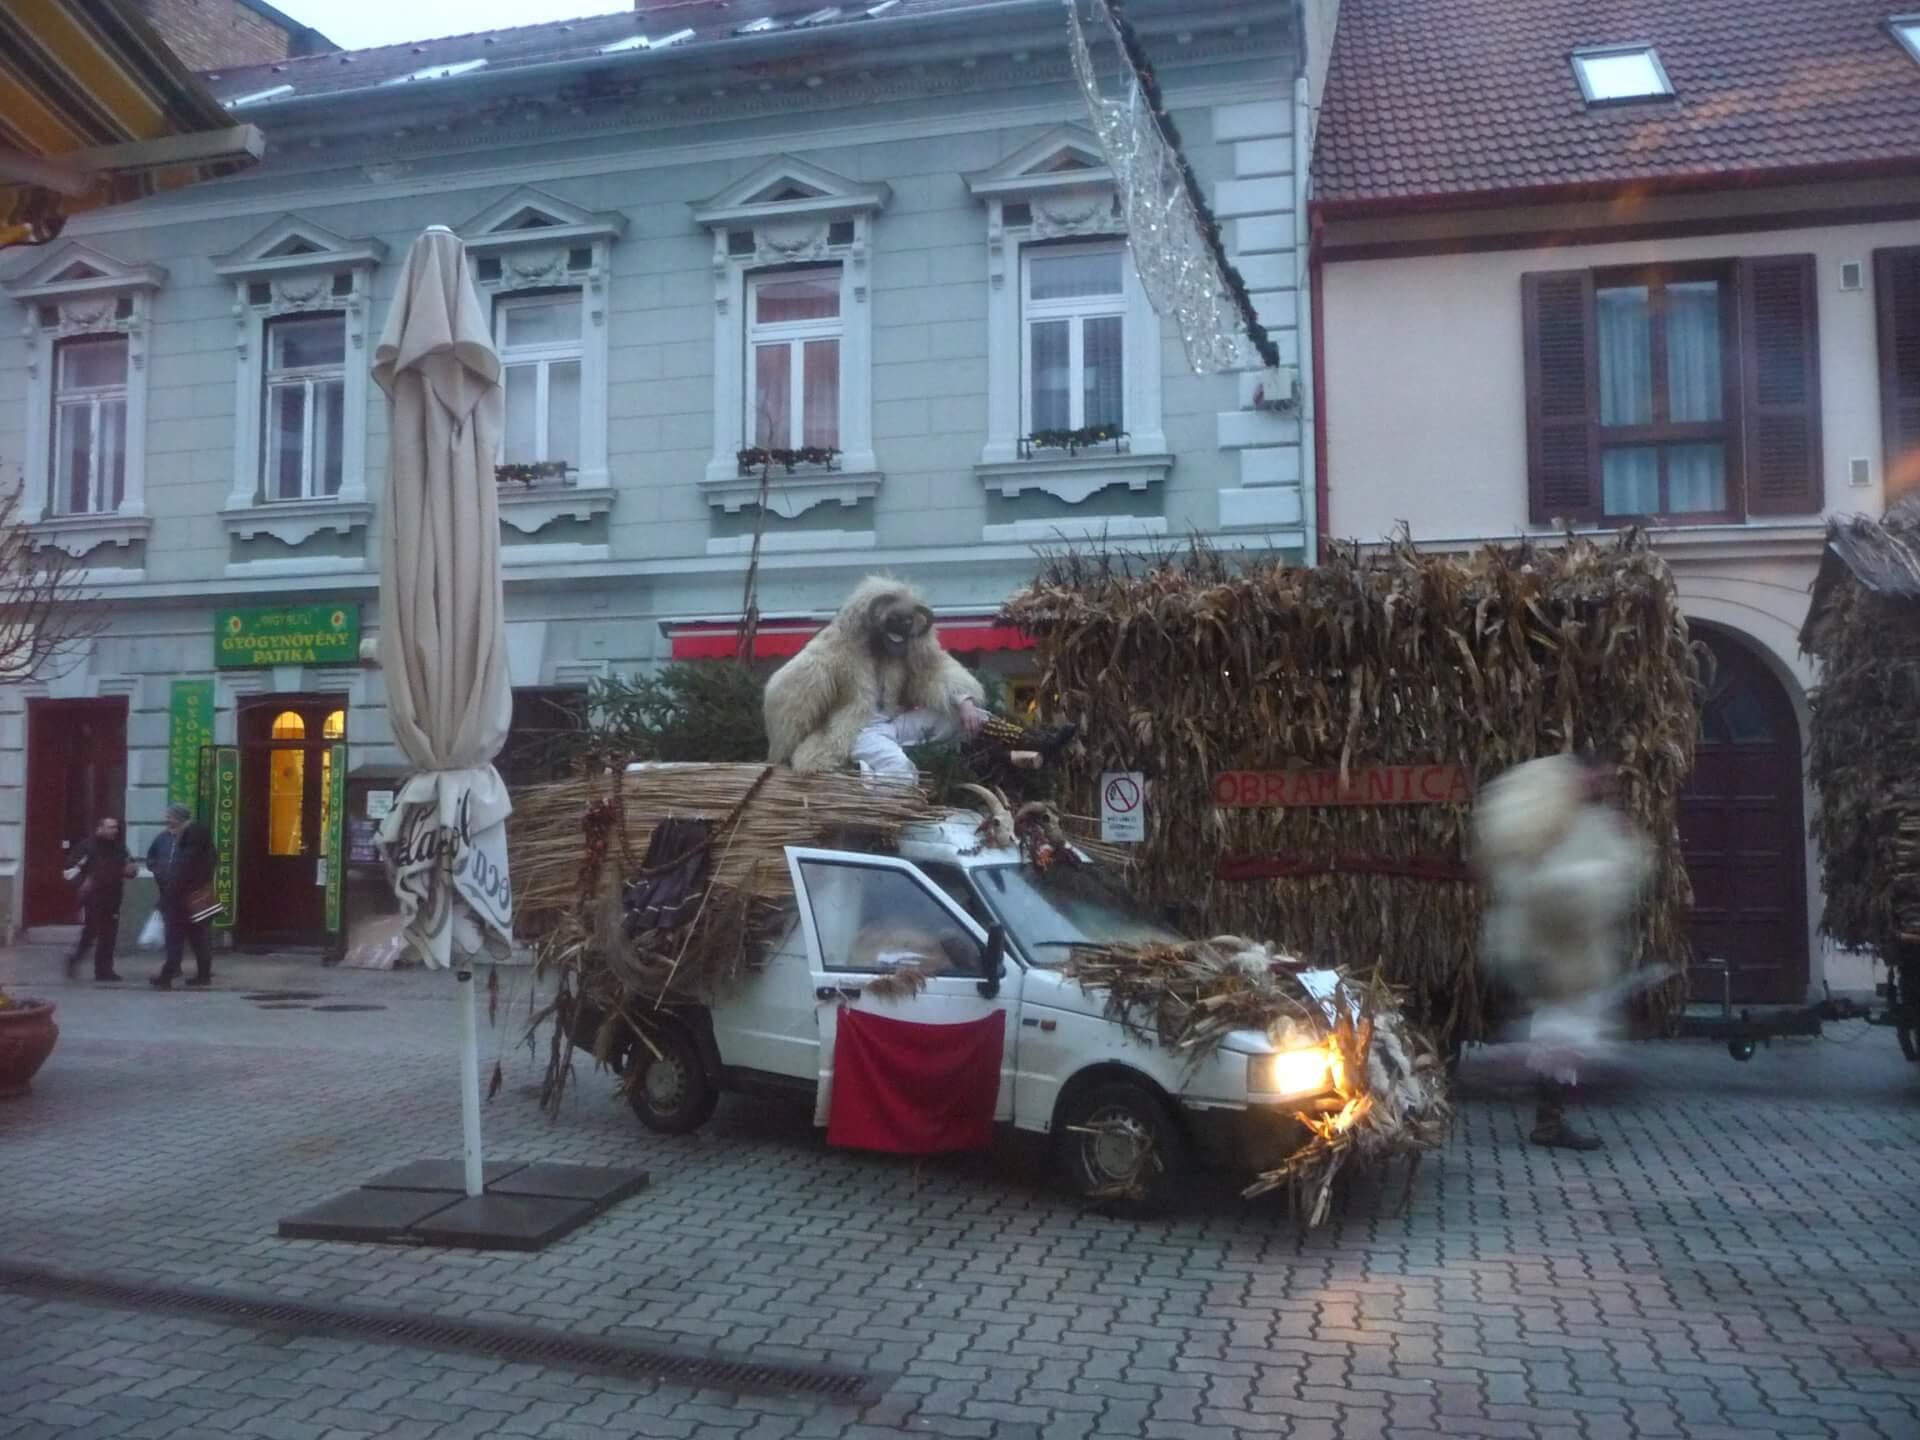 Fahrzeug für Busójárás in Mohács